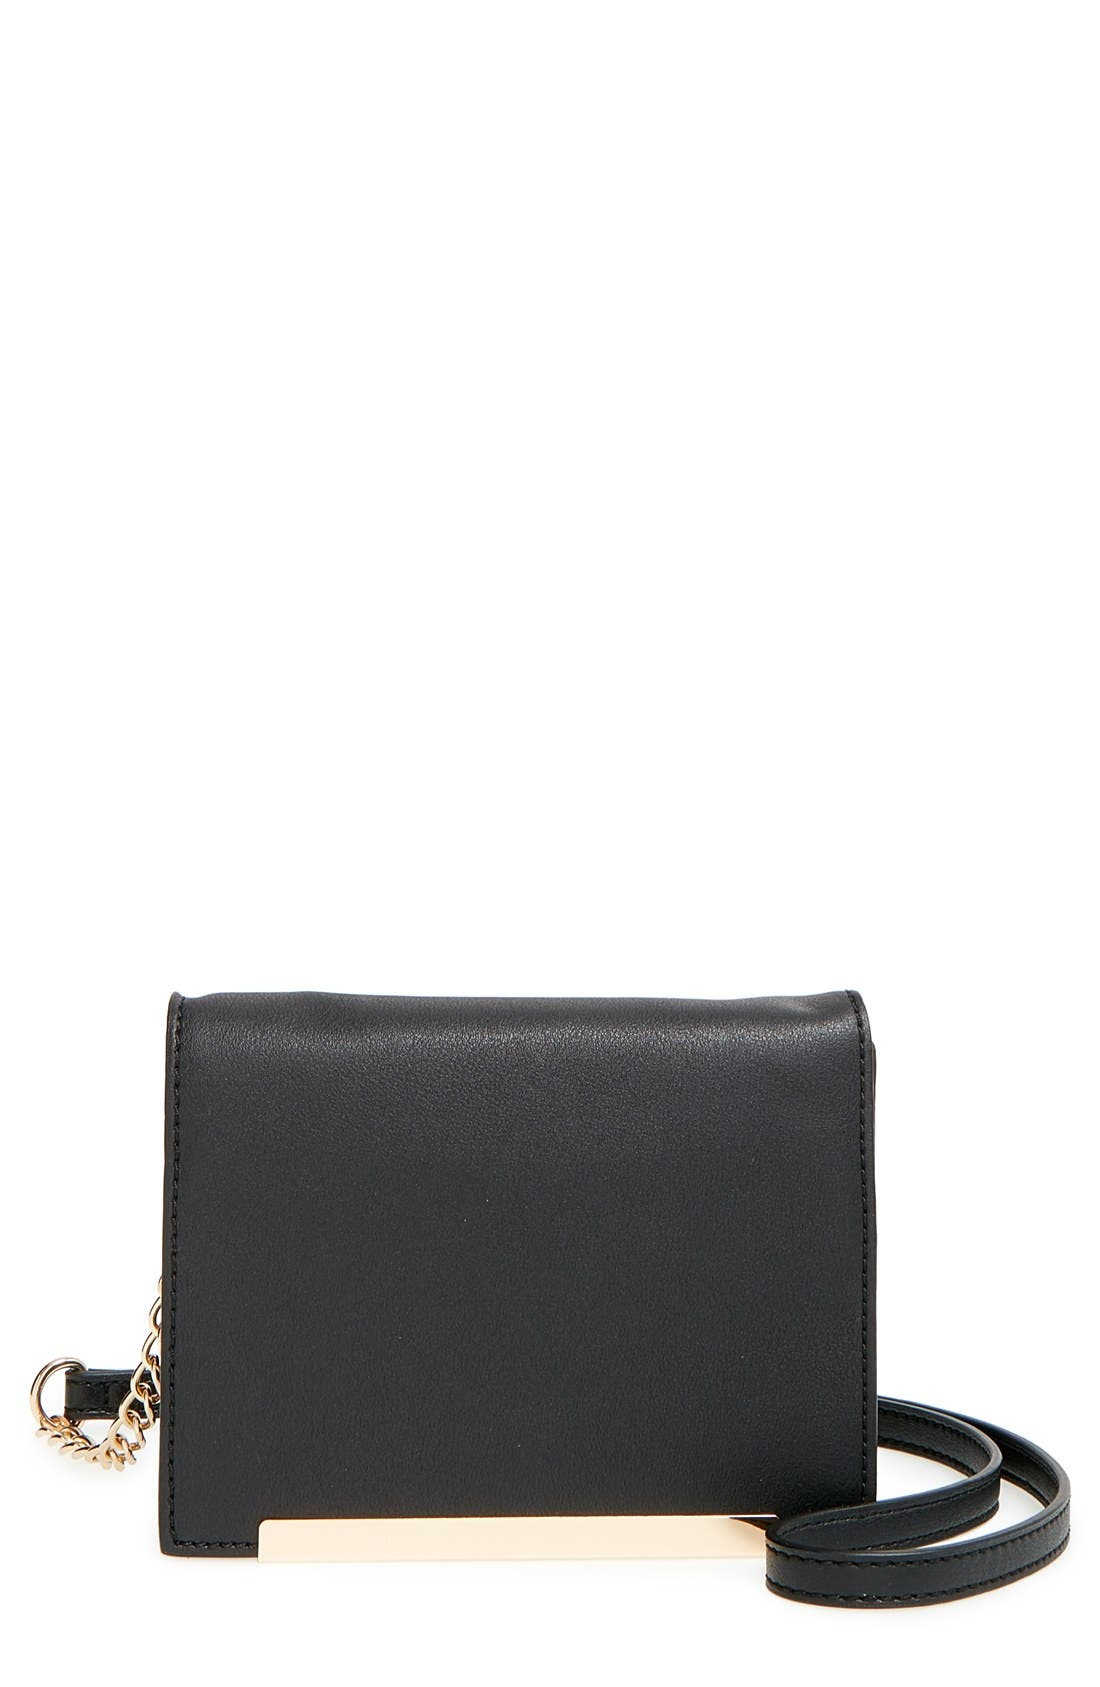 Main Image - BP. Metal Bar Mini Crossbody Bag